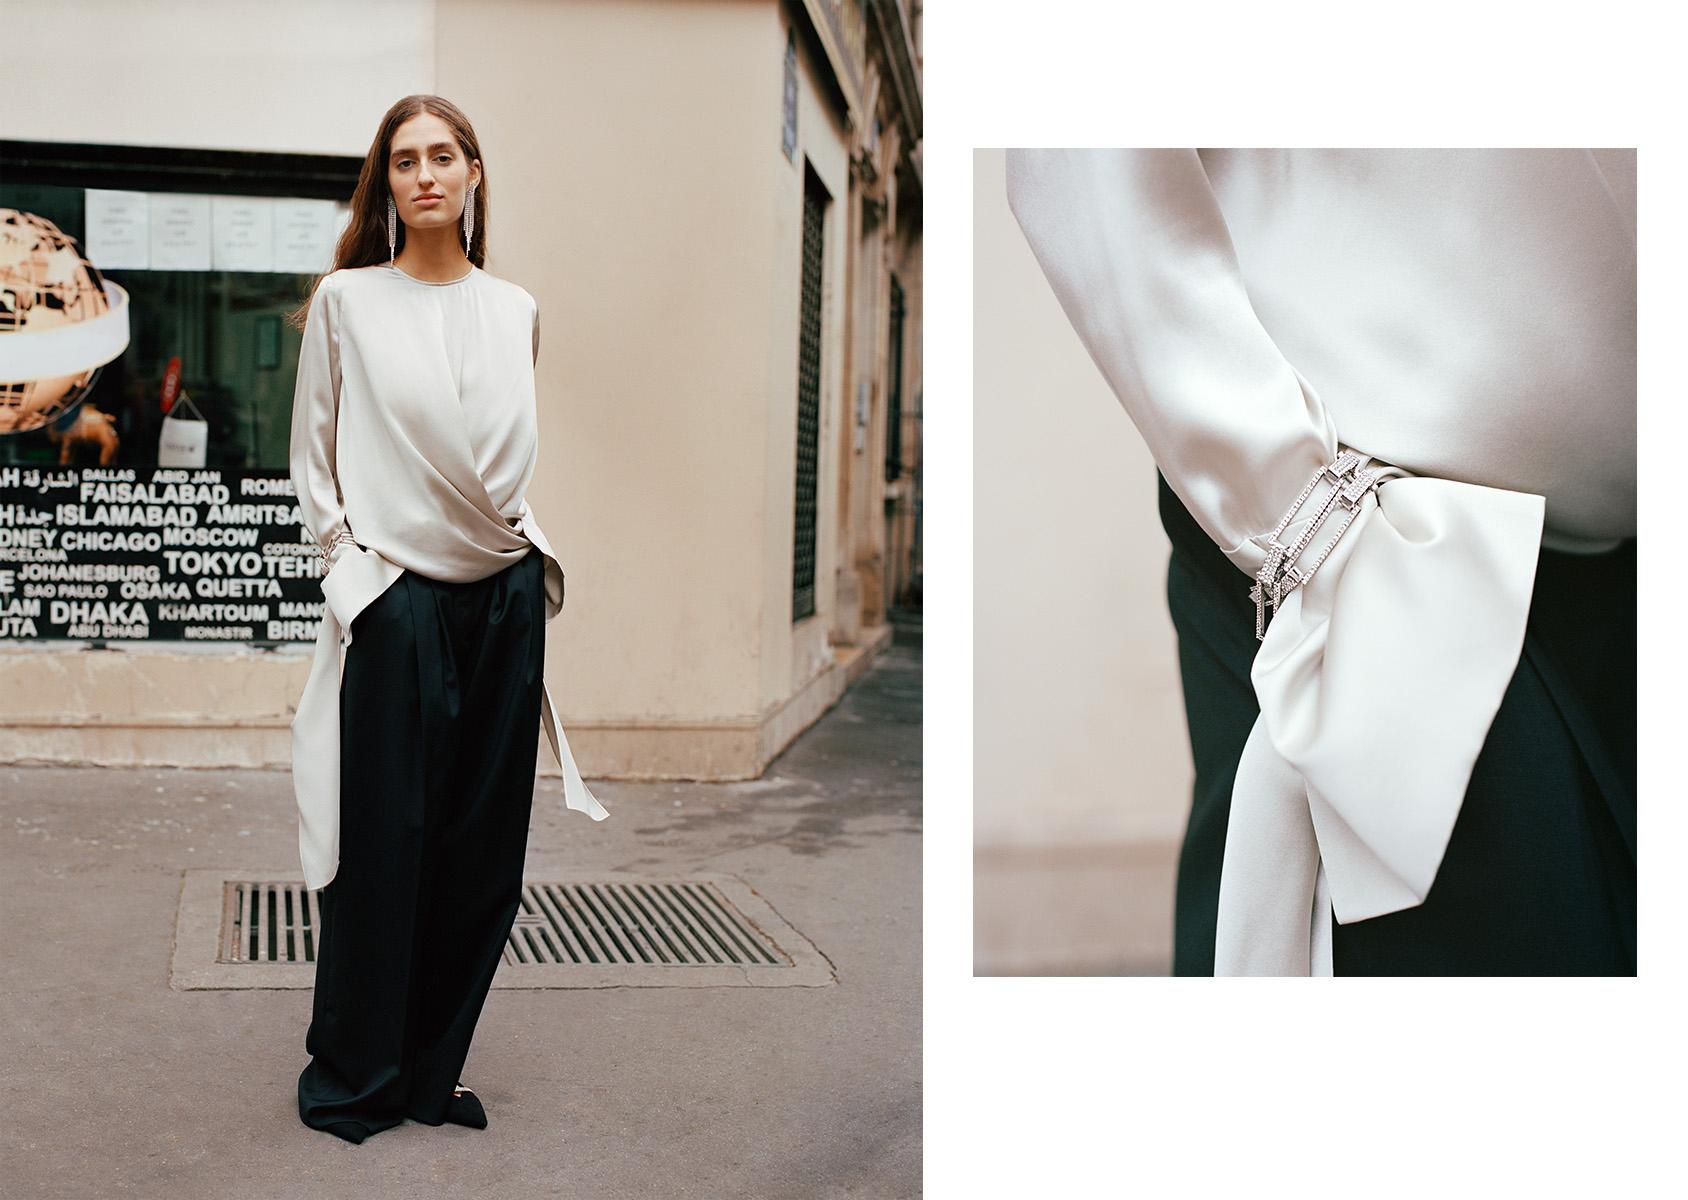 H&M 와이드 팬츠와 실크 탑. 목걸이를 팔찌처럼 착용하기.